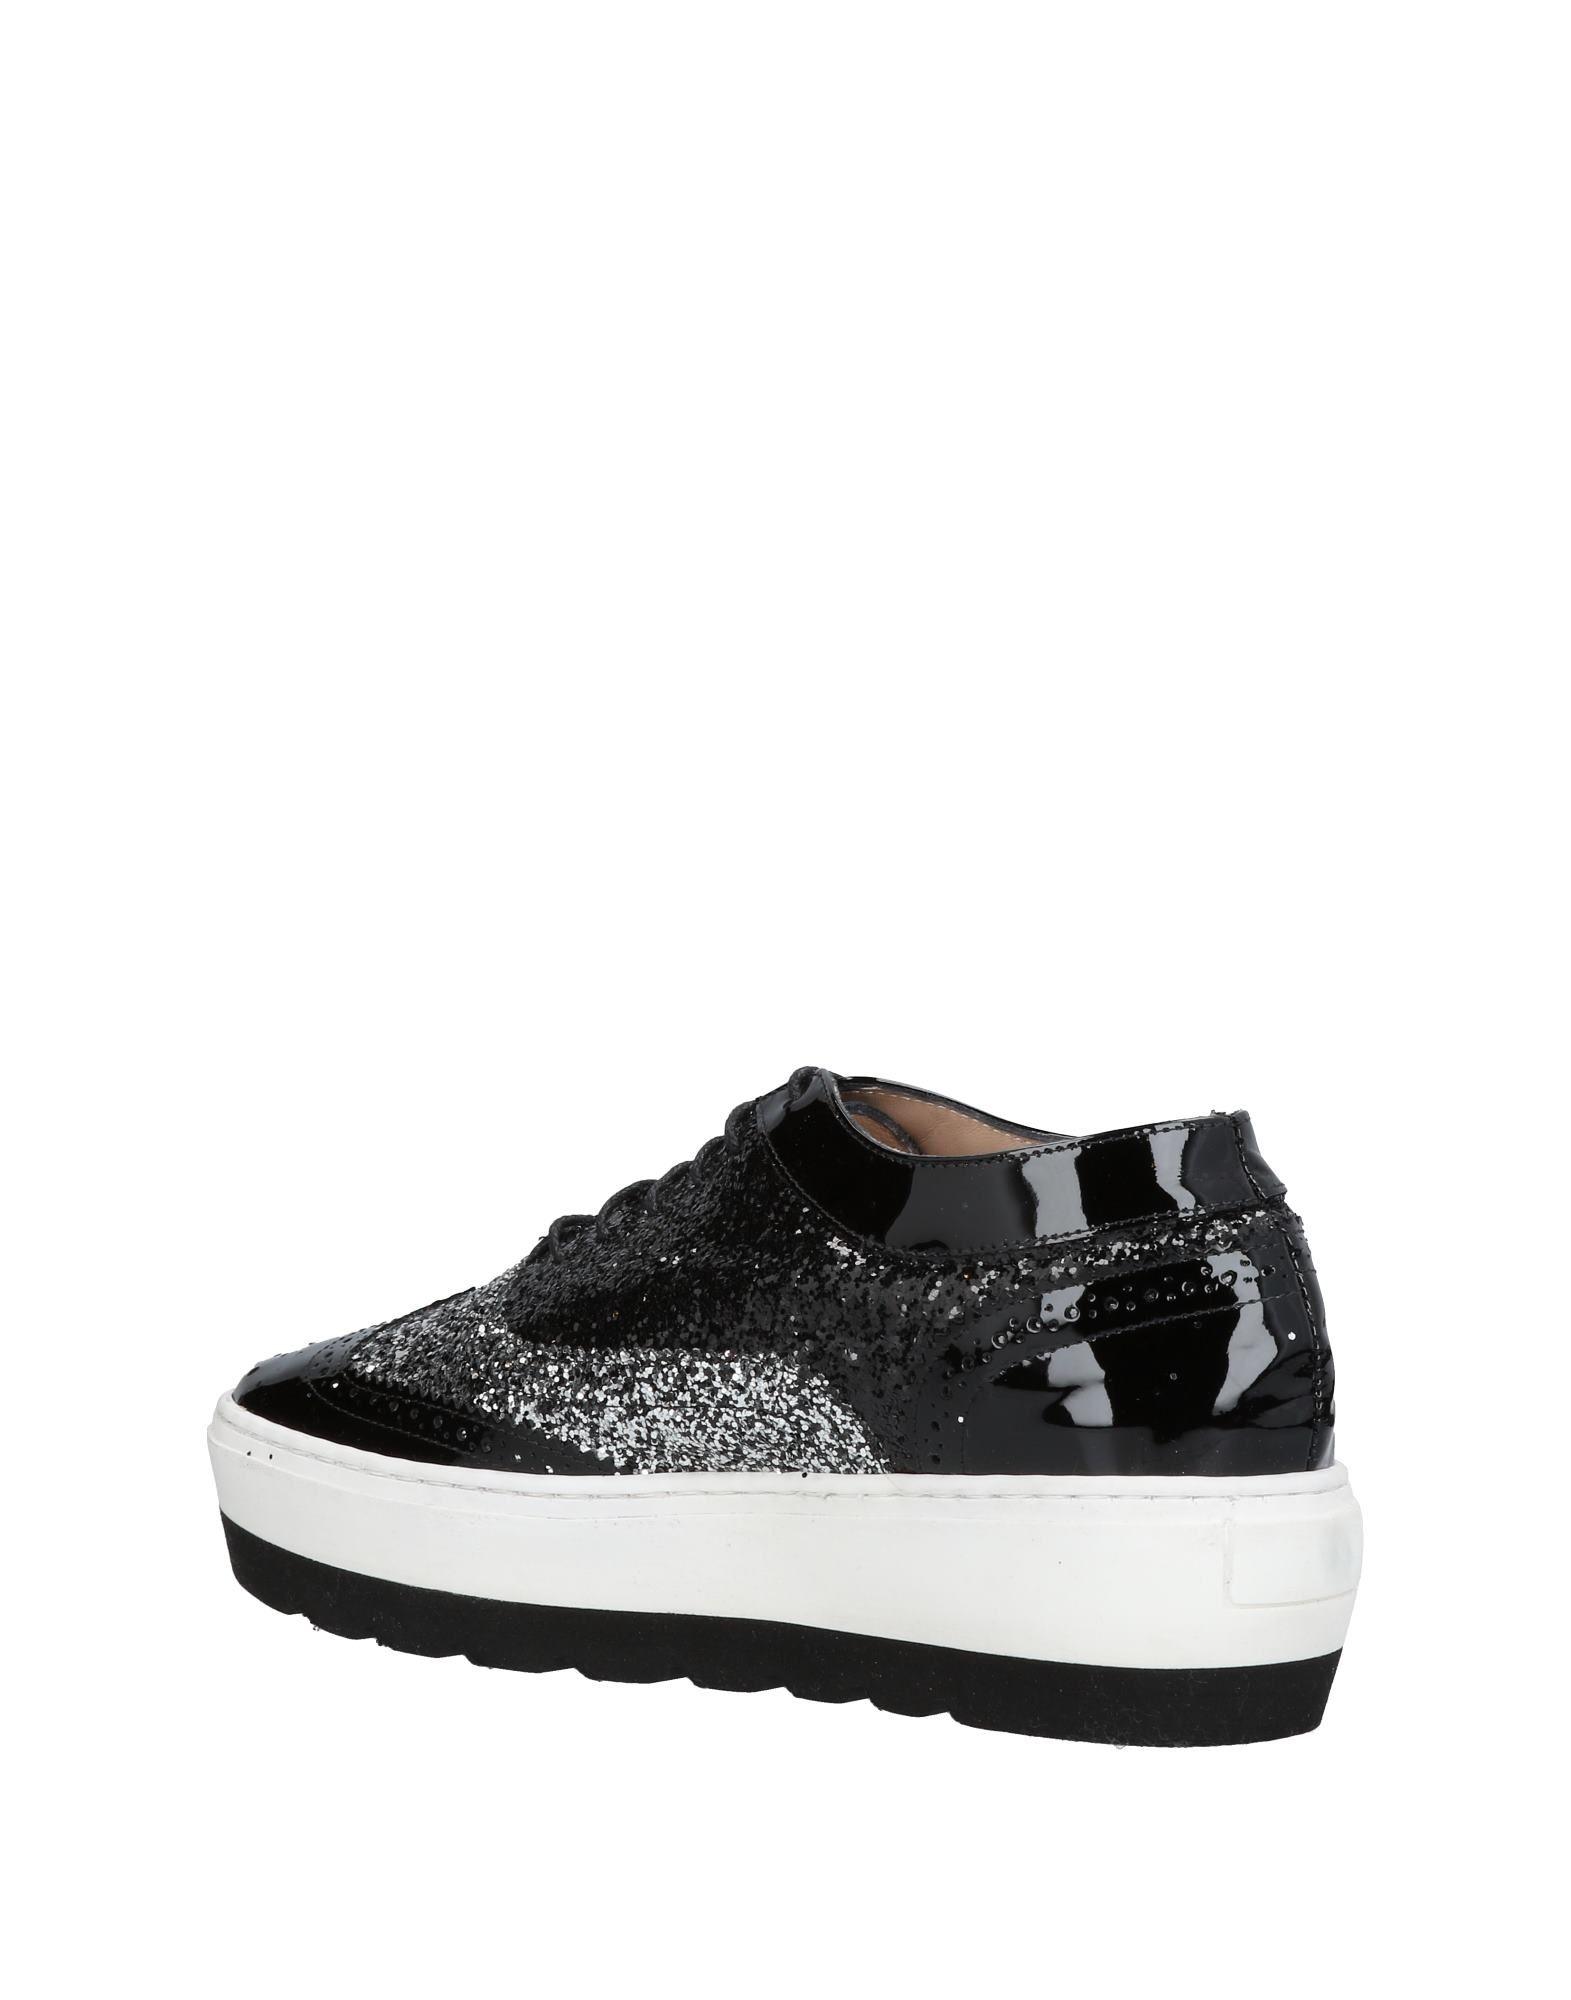 Chaussures À Lacets Santa Clara Milano Femme - Chaussures À Lacets Santa Clara Milano sur